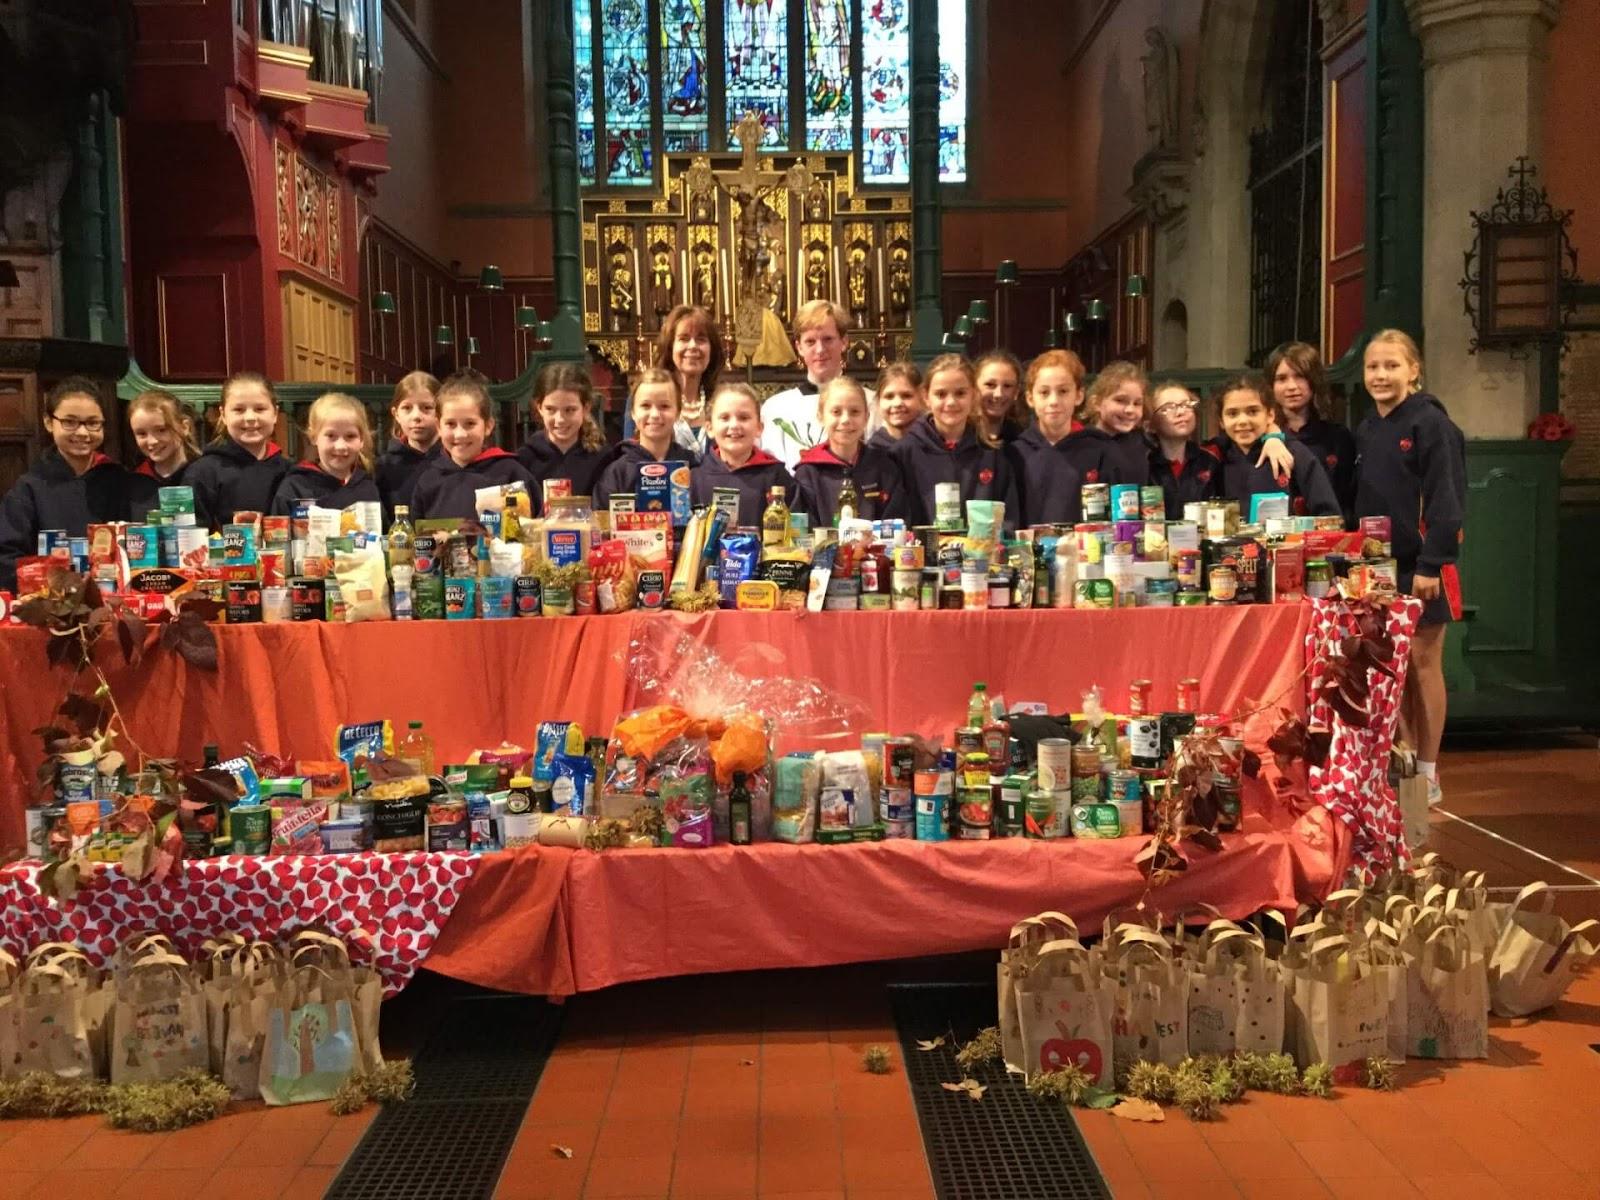 harvest festival in uk, celebrations at church